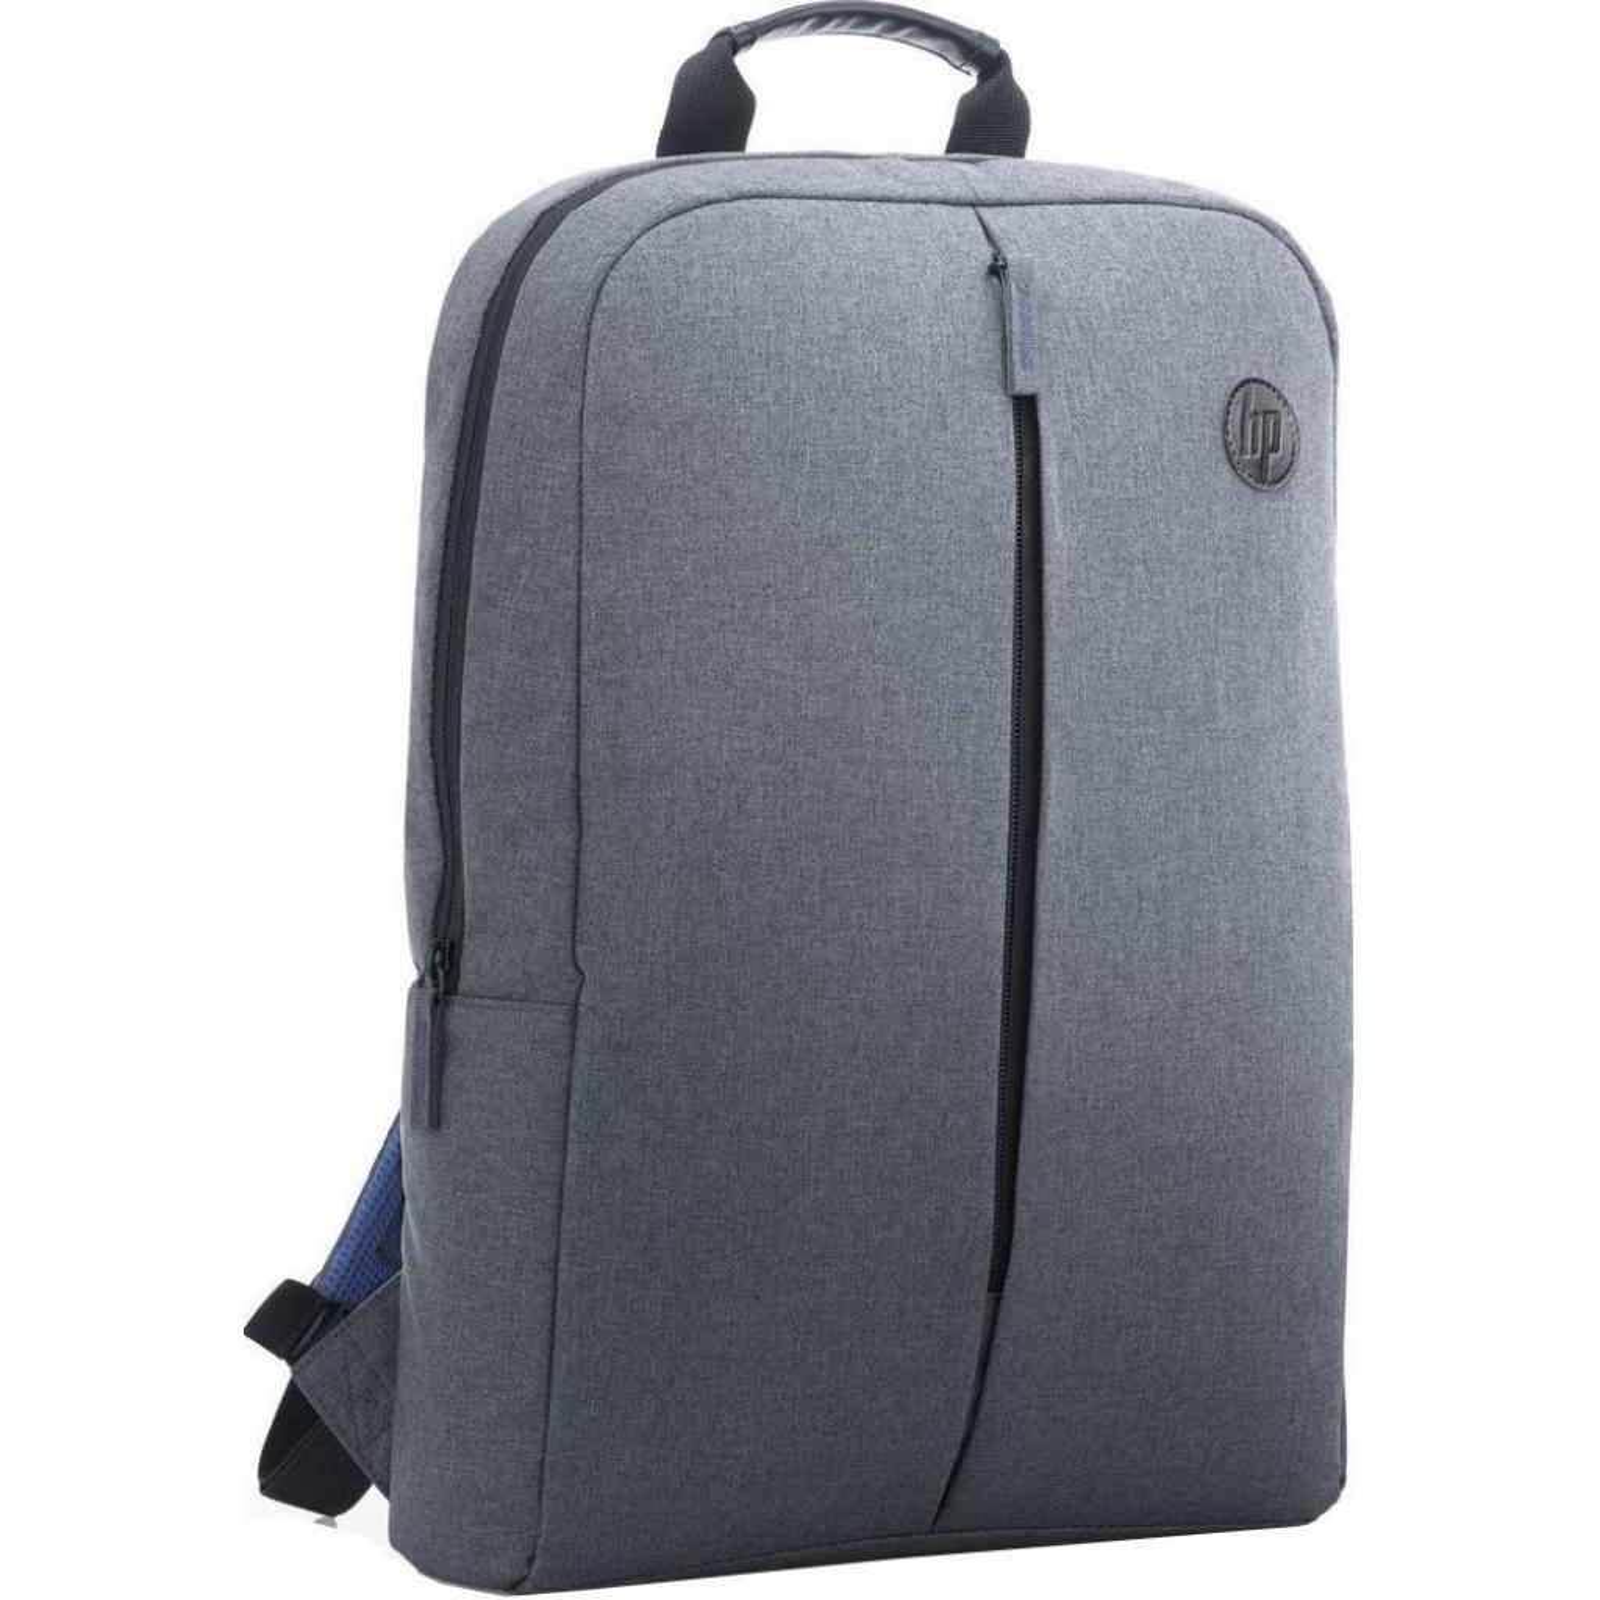 "Рюкзак для ноутбука HP 15.6"" Value Grey (K0B39AA) изображение 4"